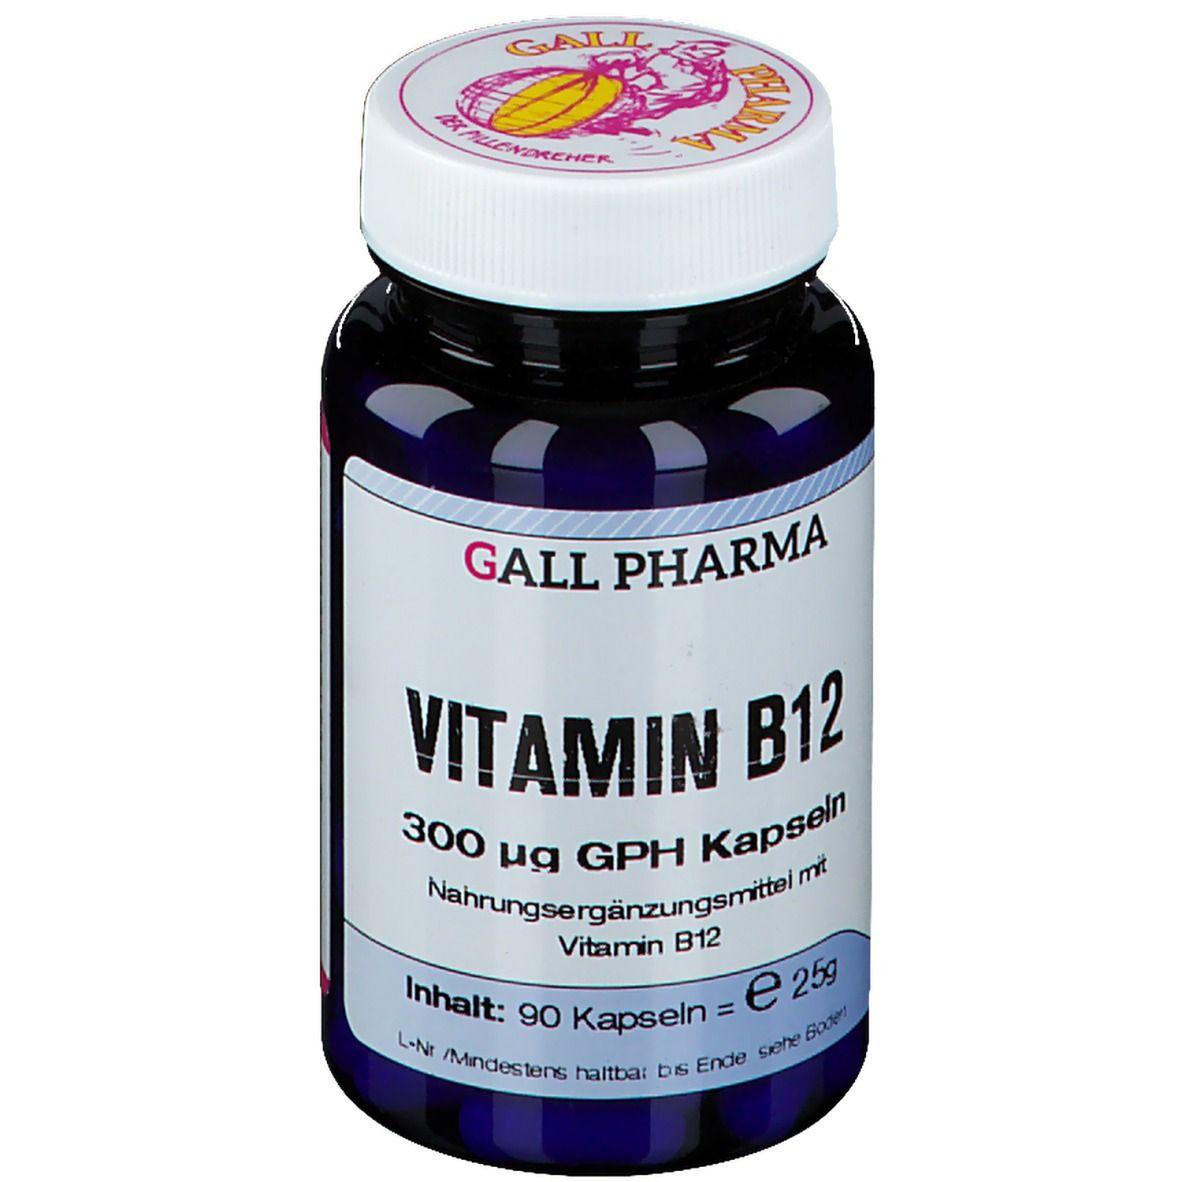 Hecht Vitamin B12 300 µg GPH